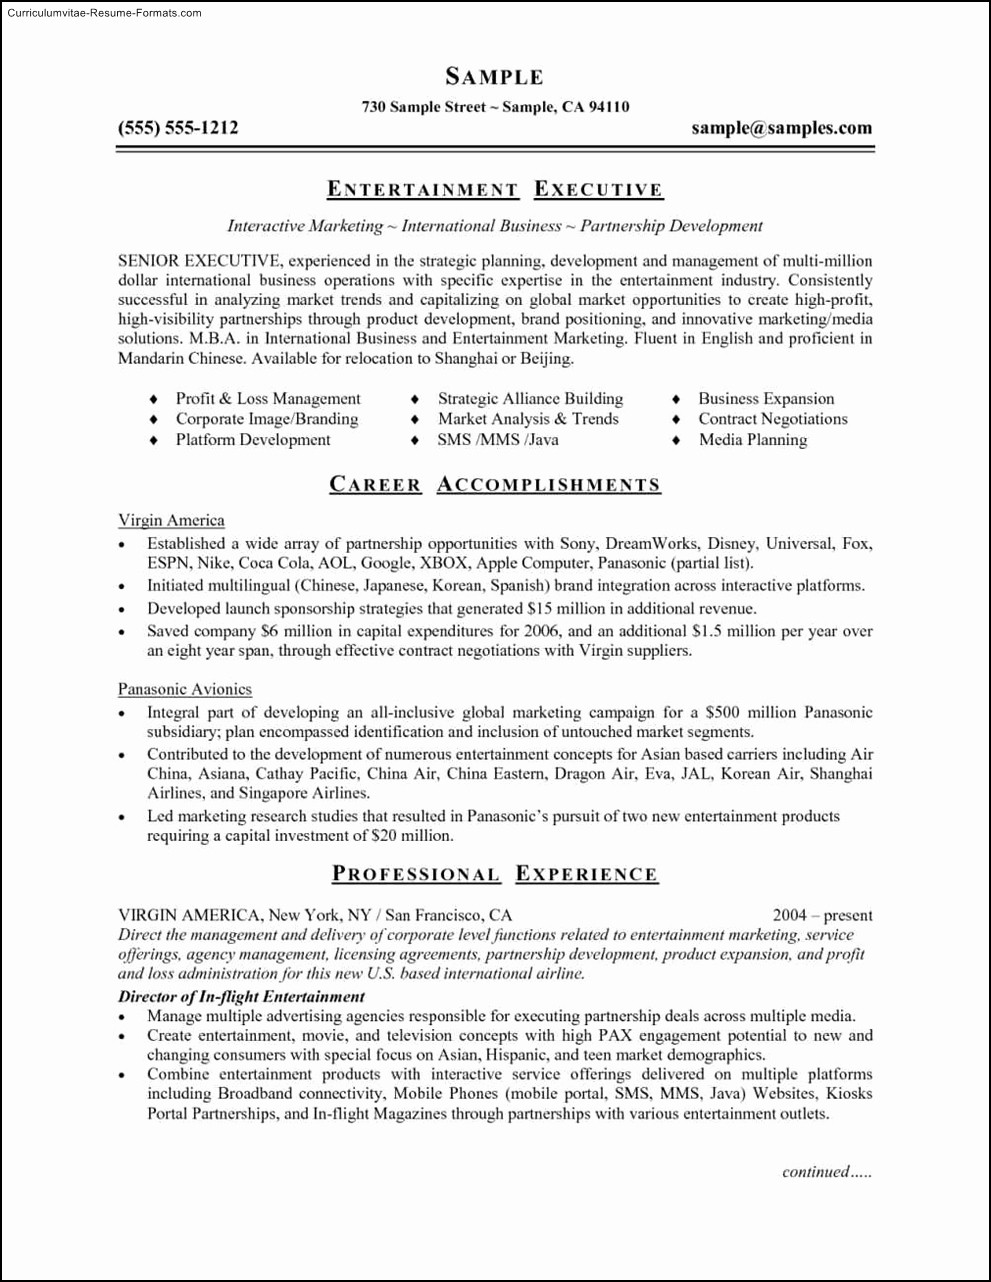 Download Ms Word Resume Template Elegant Microsoft Word 2003 Resume Template Free Download Free